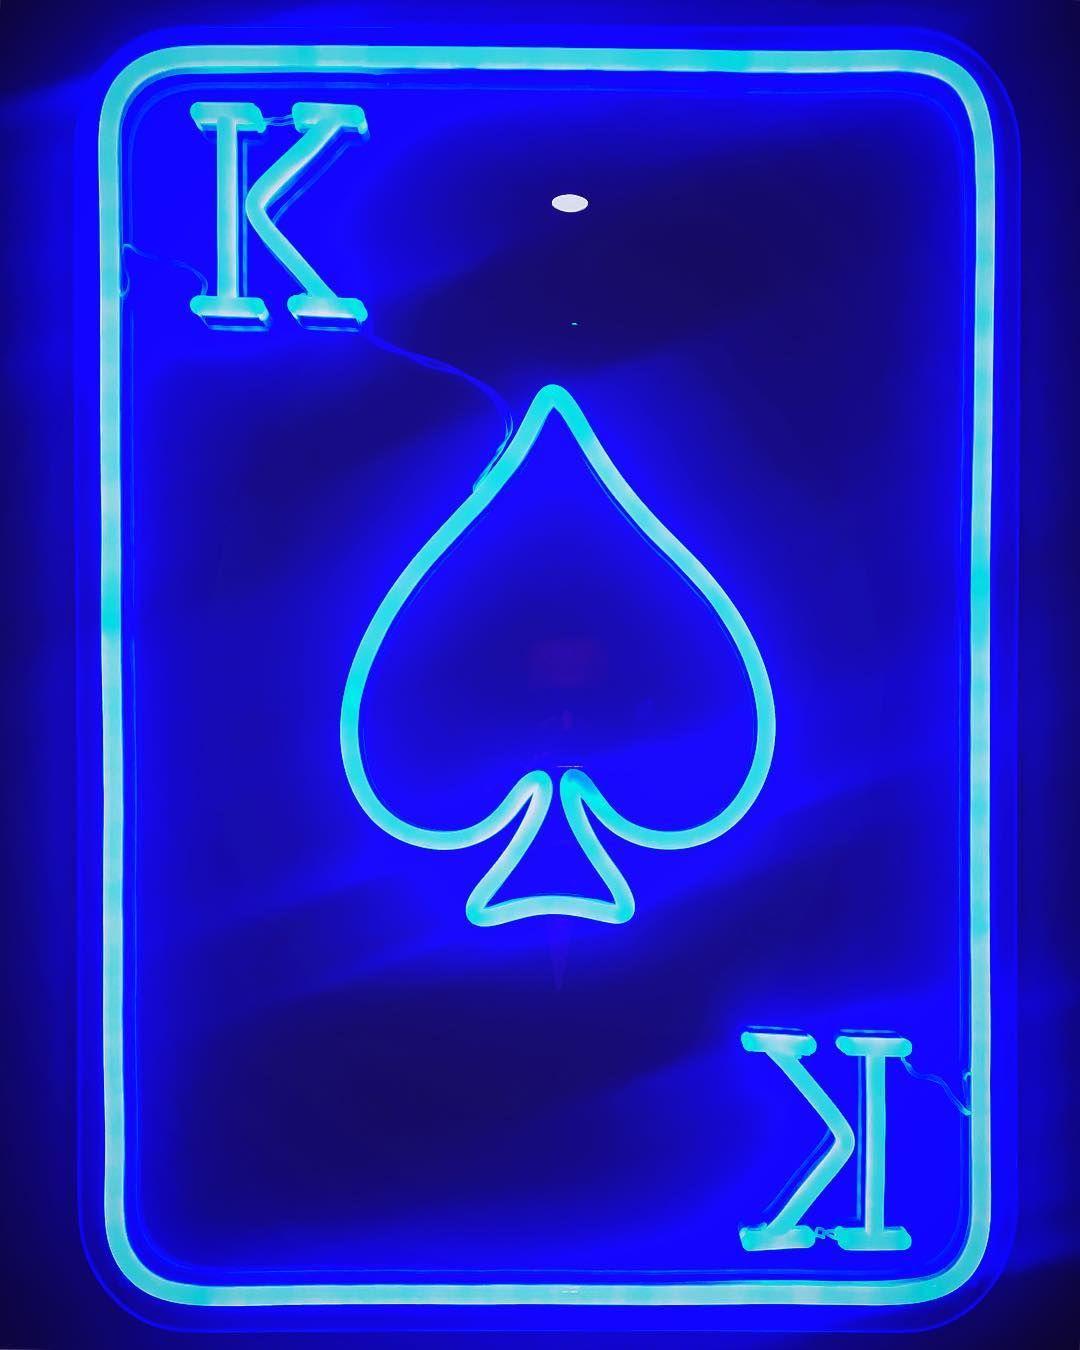 Neoking Neon Spades Art Neonart Artgallery Loo Blue Kleinblue Electricblue Mirror L Blue Aesthetic Grunge Blue Aesthetic Pastel Light Blue Aesthetic Electric blue neon neon wallpaper